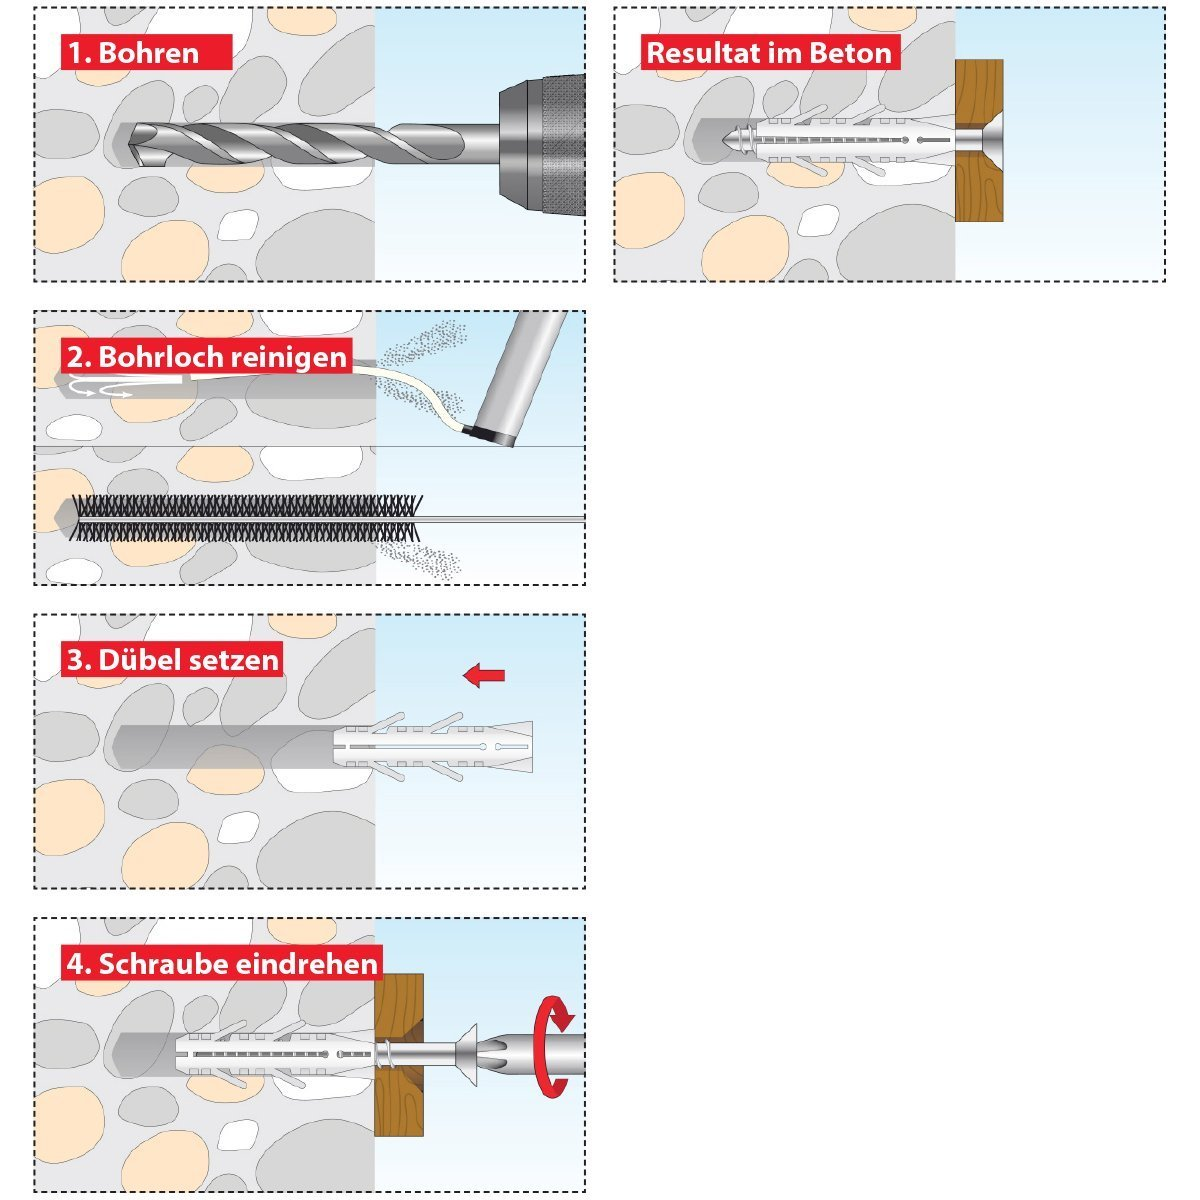 TOX Spreizd/übel Barracuda 14 x 70 mm D/übel f/ür Vollbaustoffe 013100121 100 /% Nylon 20 St/ück